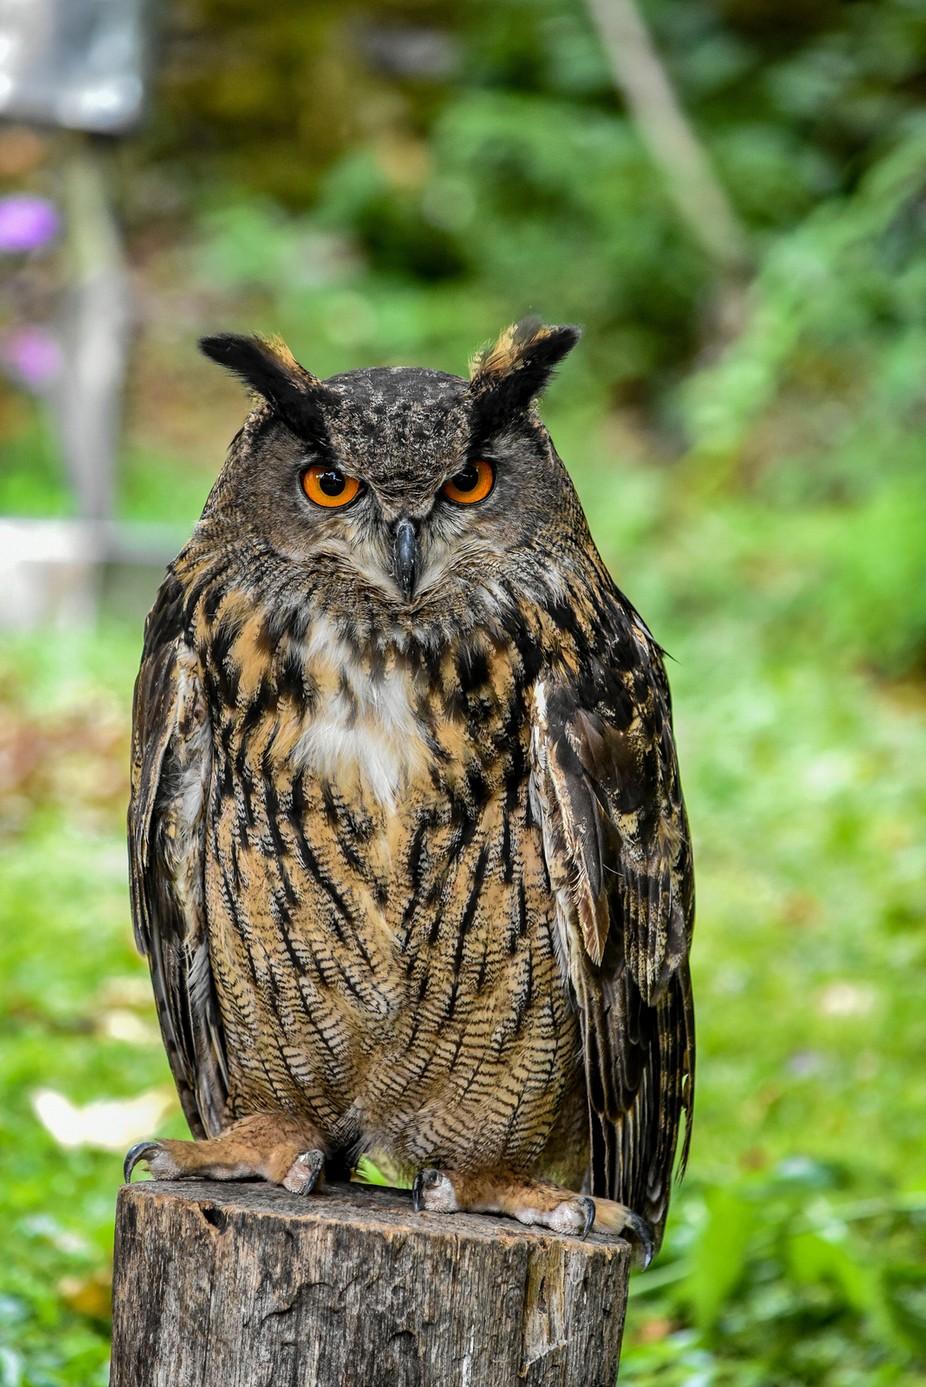 European Eagle Owl by samdownie - Beautiful Owls Photo Contest